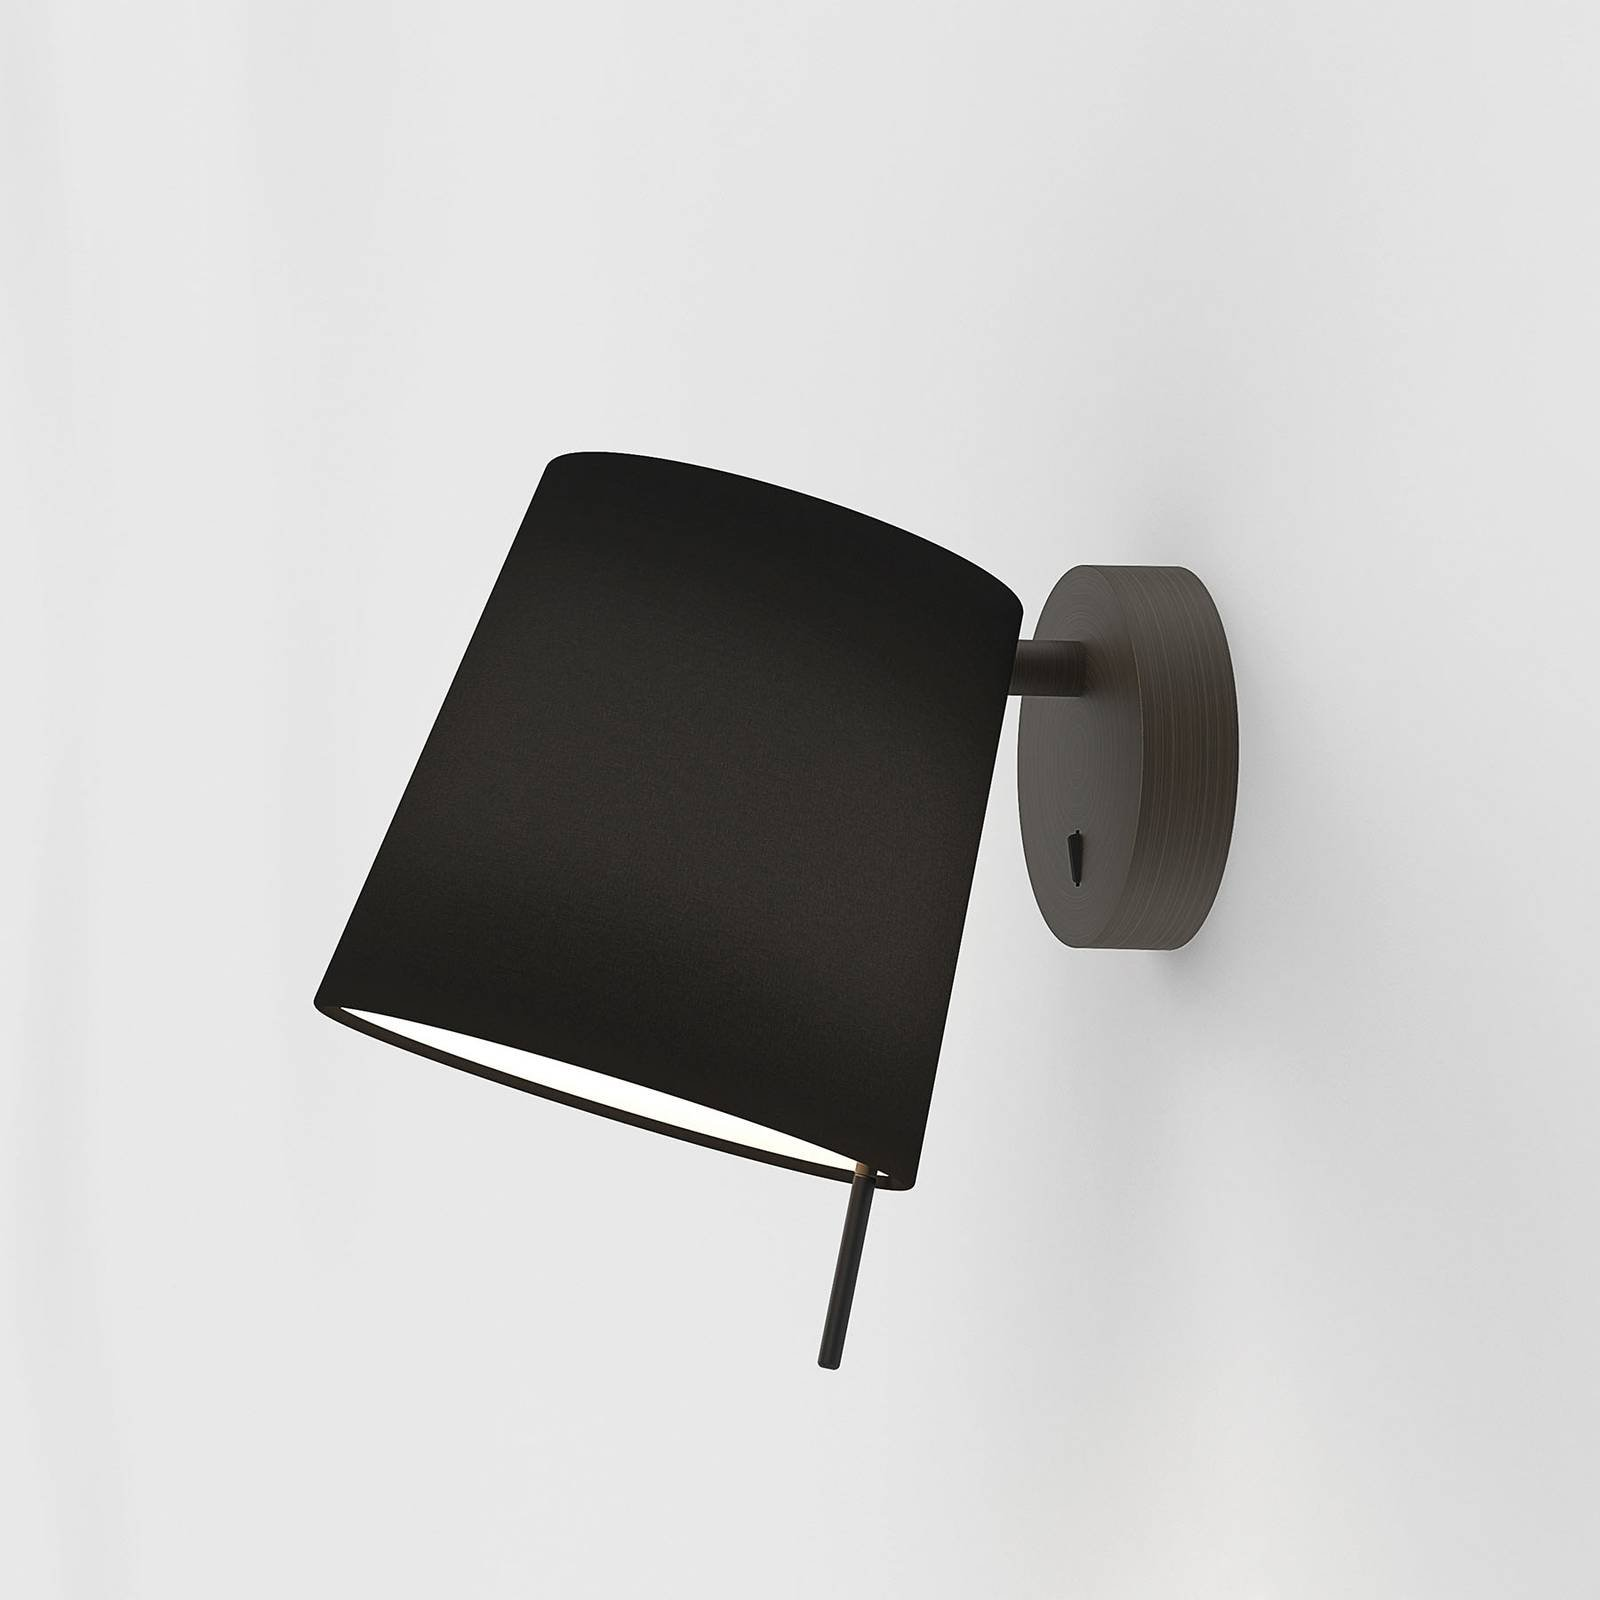 Vegglampe Mitsu Wall Bronze, svart skjerm